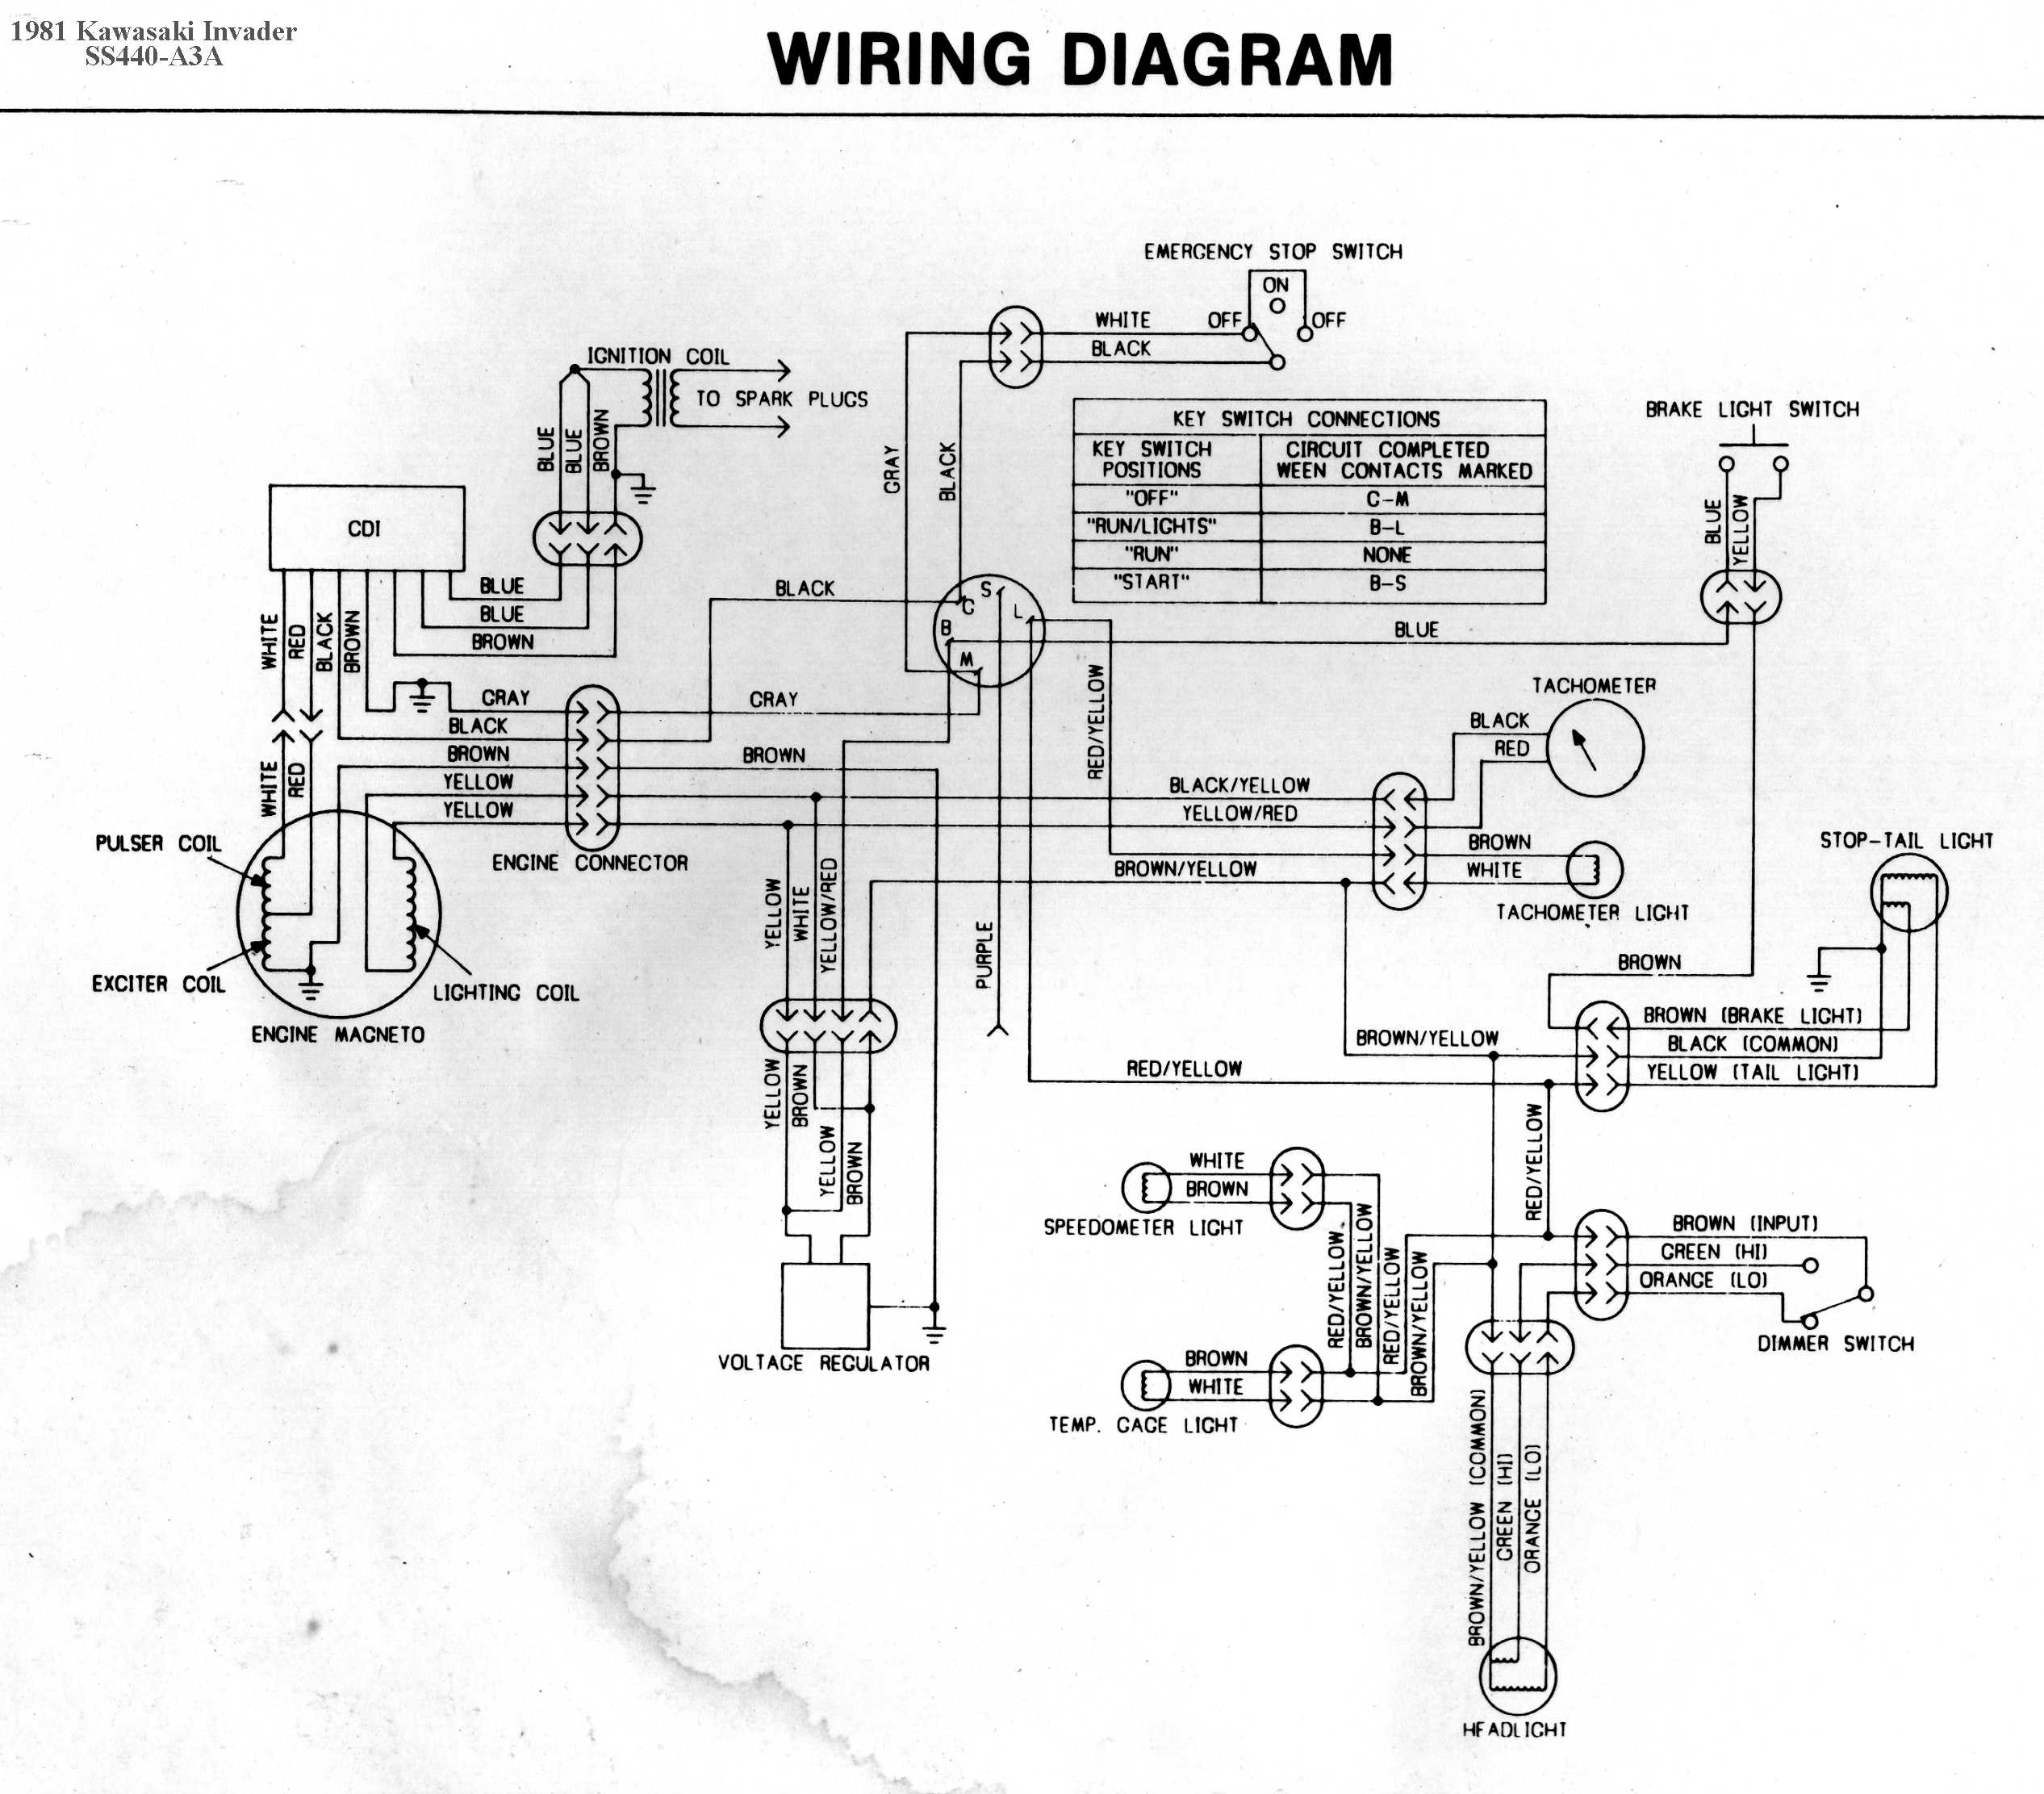 [DIAGRAM_38IU]  CH_4866] 650Sx Wiring Diagram Wiring Diagram | Kawasaki 650sx Wiring Diagram |  | Apan Mopar Phil Cajos Hendil Mohammedshrine Librar Wiring 101